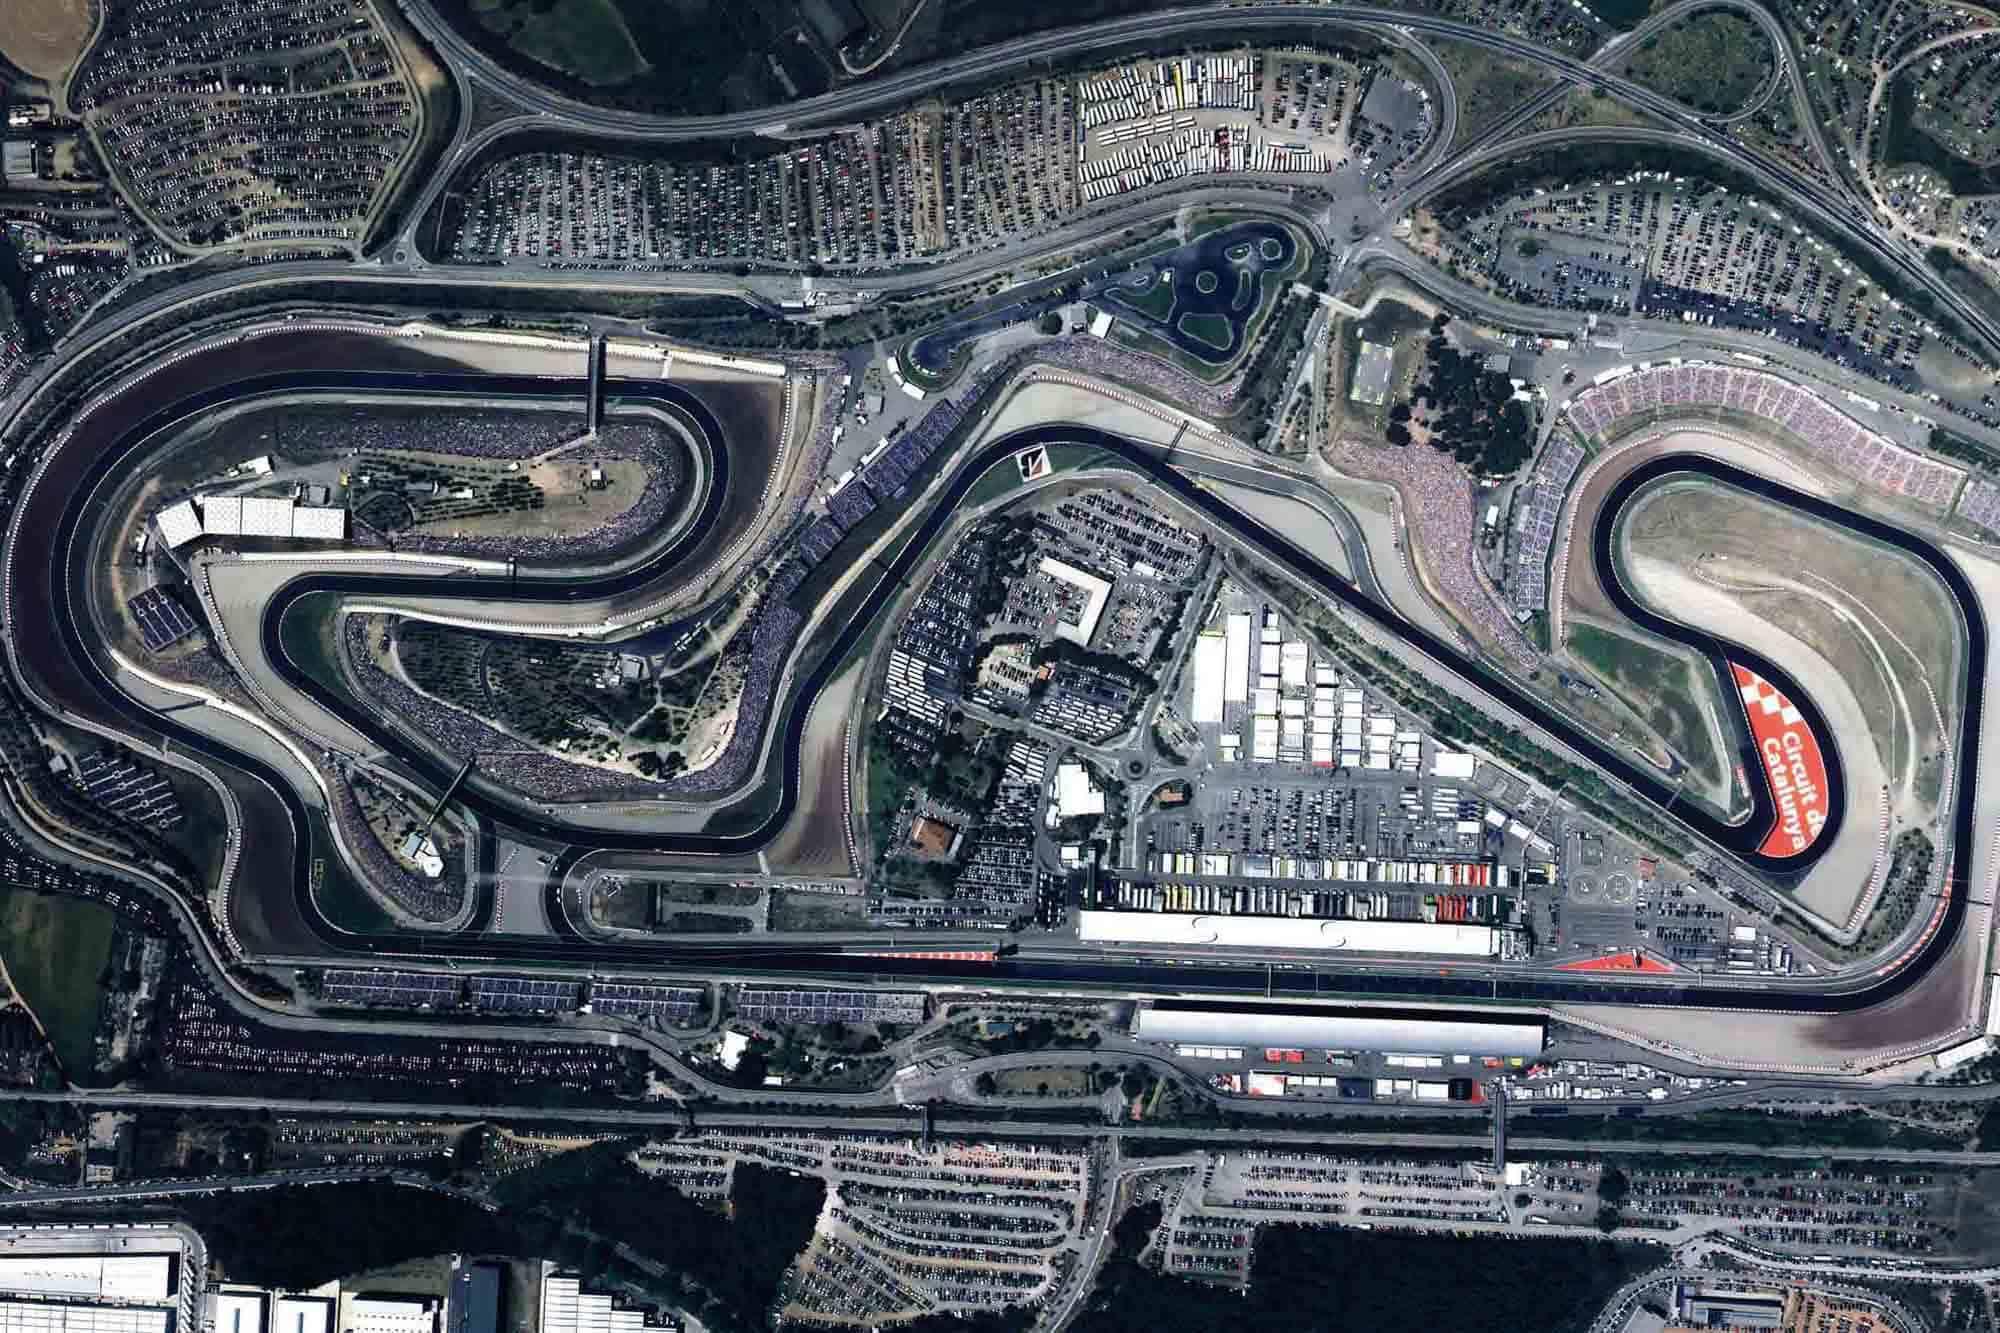 Circuit De Barcelona Catalunya 01 - Home